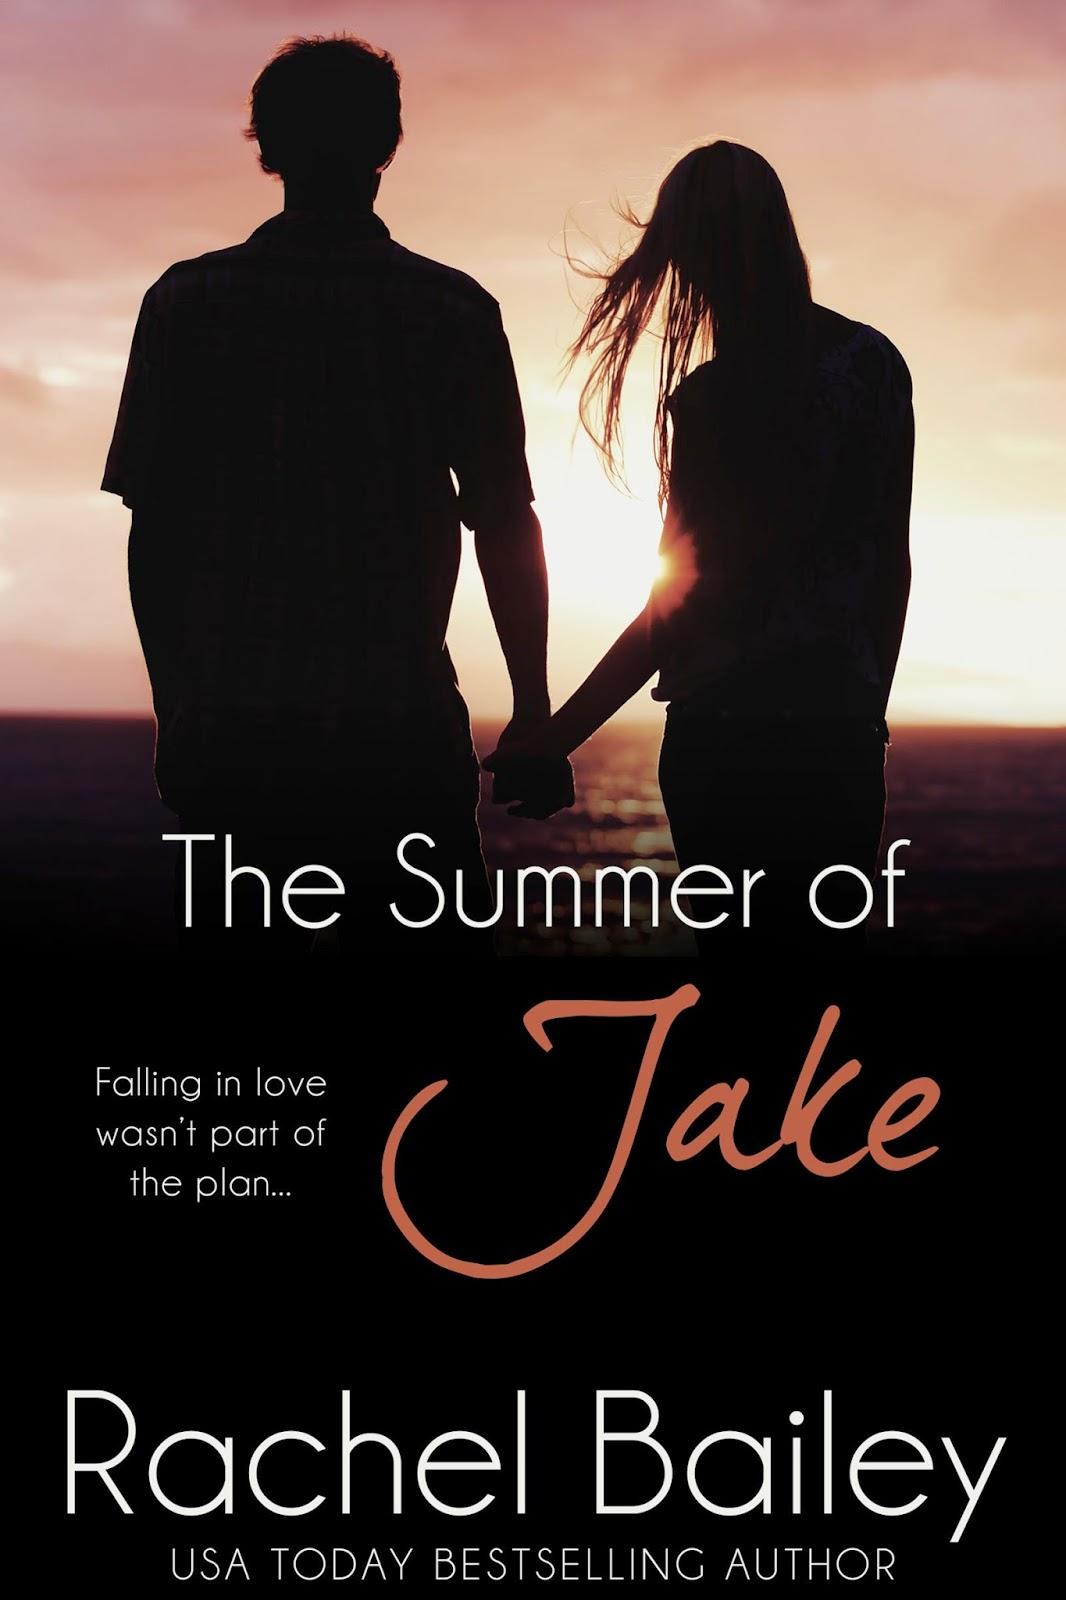 http://www.amazon.com/Summer-Jake-Entangled-Embrace-ebook/dp/B00LRY2TWU/ref=sr_1_1?ie=UTF8&qid=1409230088&sr=8-1&keywords=the+summer+of+jake